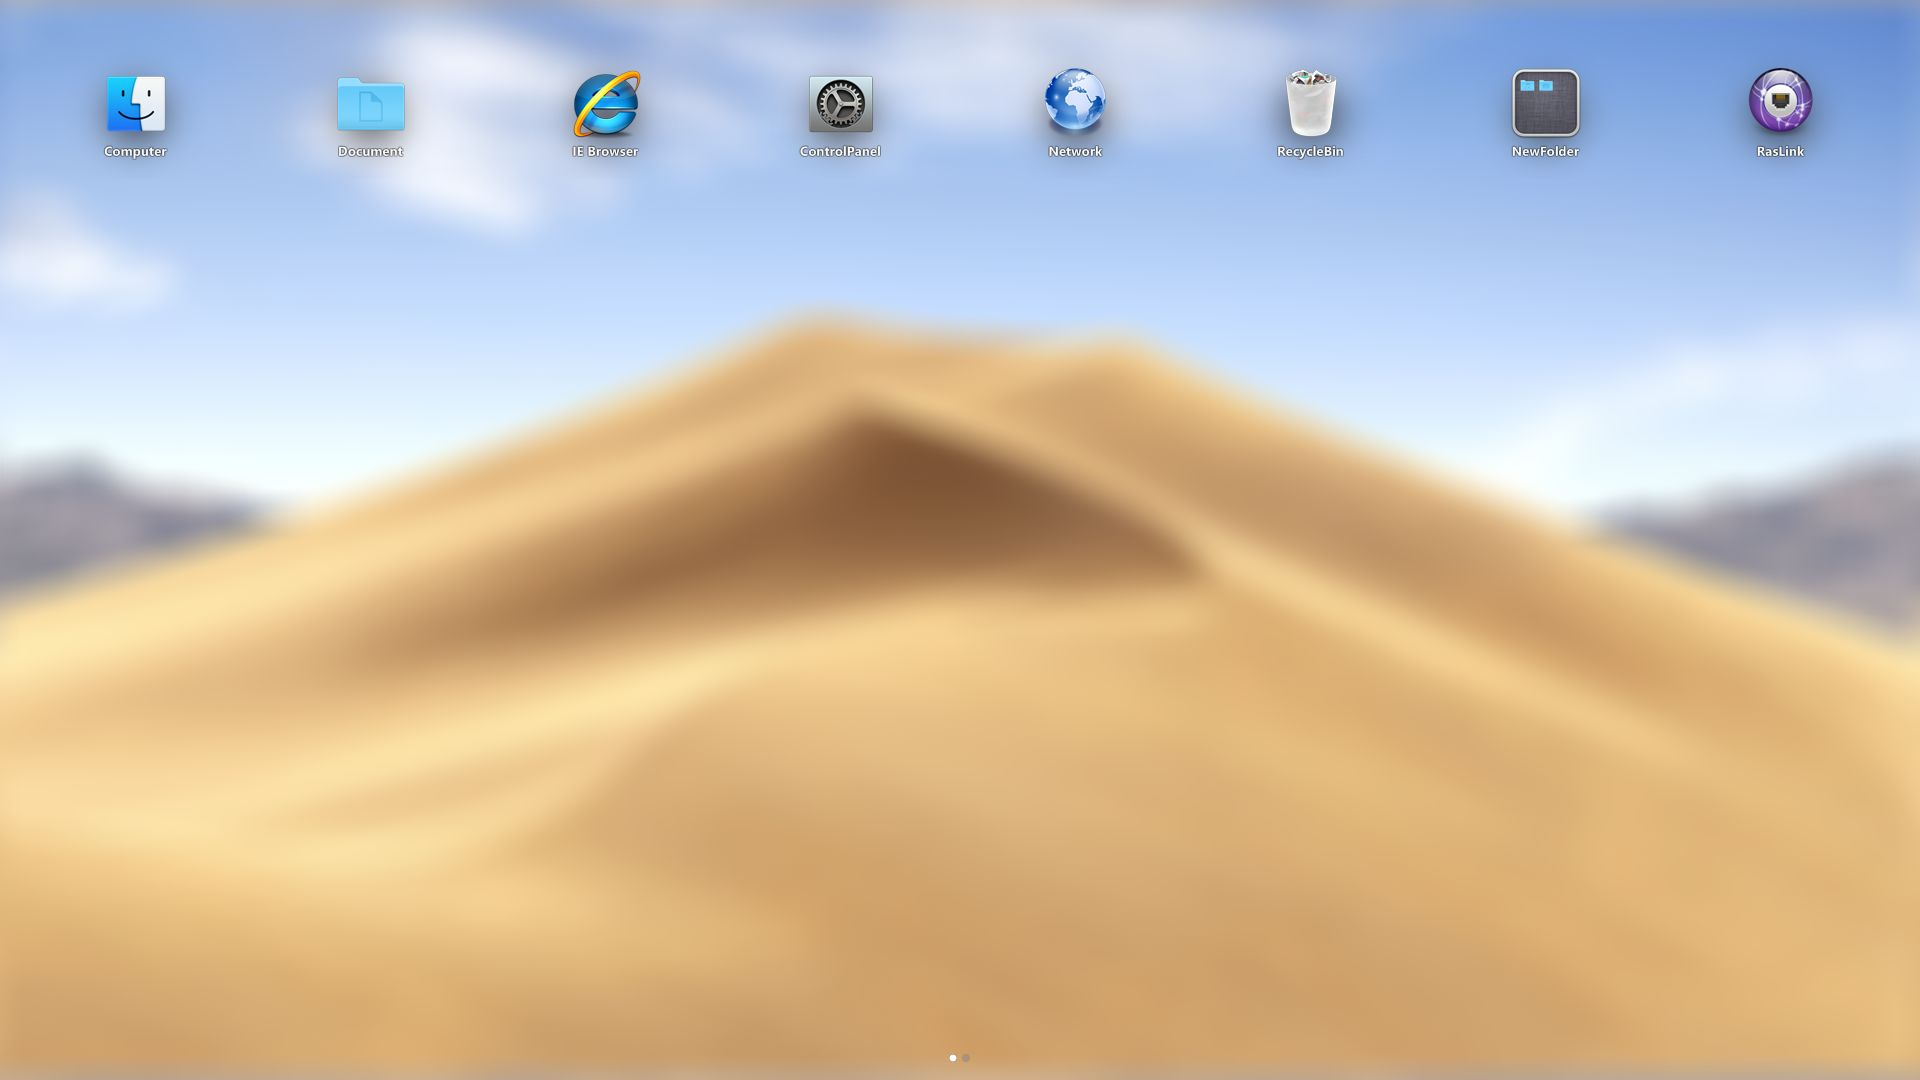 macOS Mojave SkinPack for Windows 78 110 RS5 - SkinPack